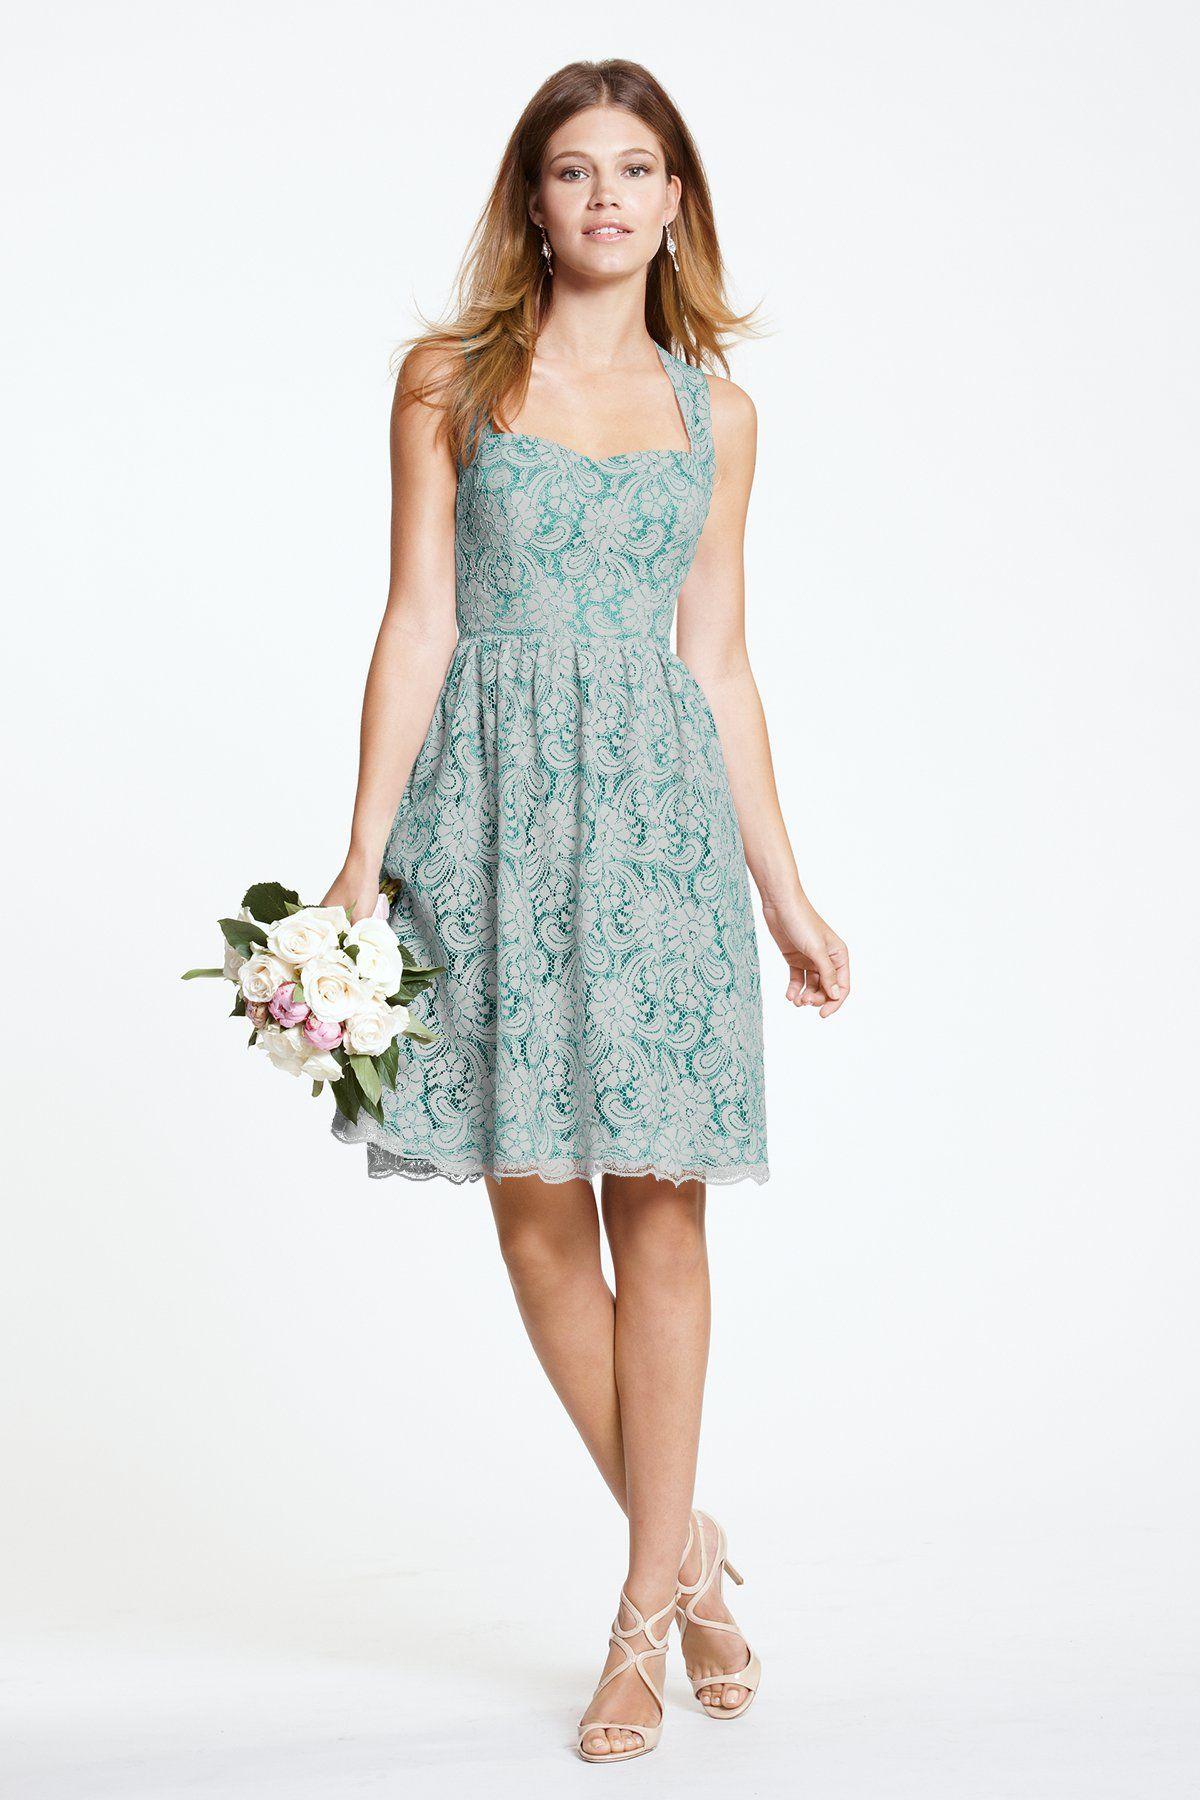 Watters Maids Dress Sisley | Wedding attire | Pinterest | Maids ...